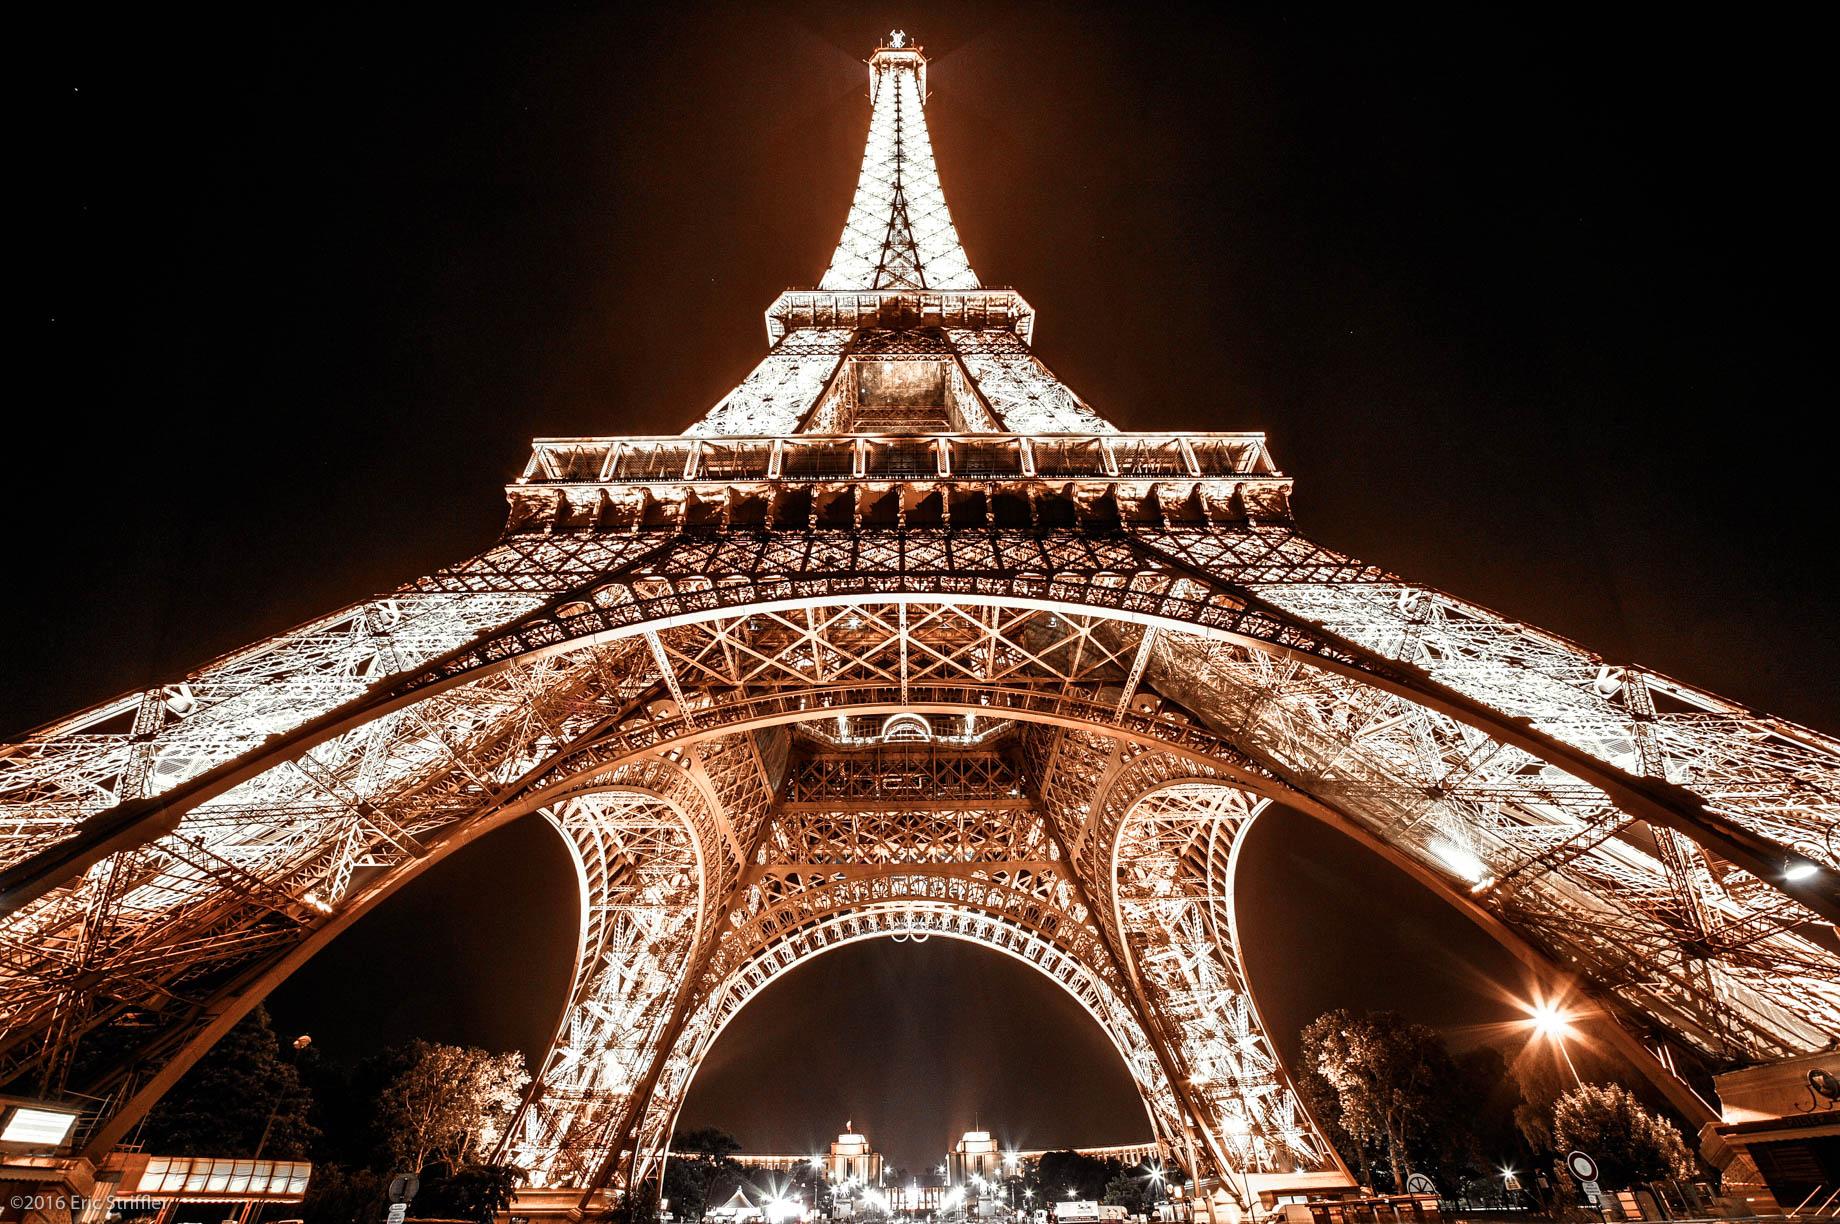 eric_striffler_photography_travel-106.jpg